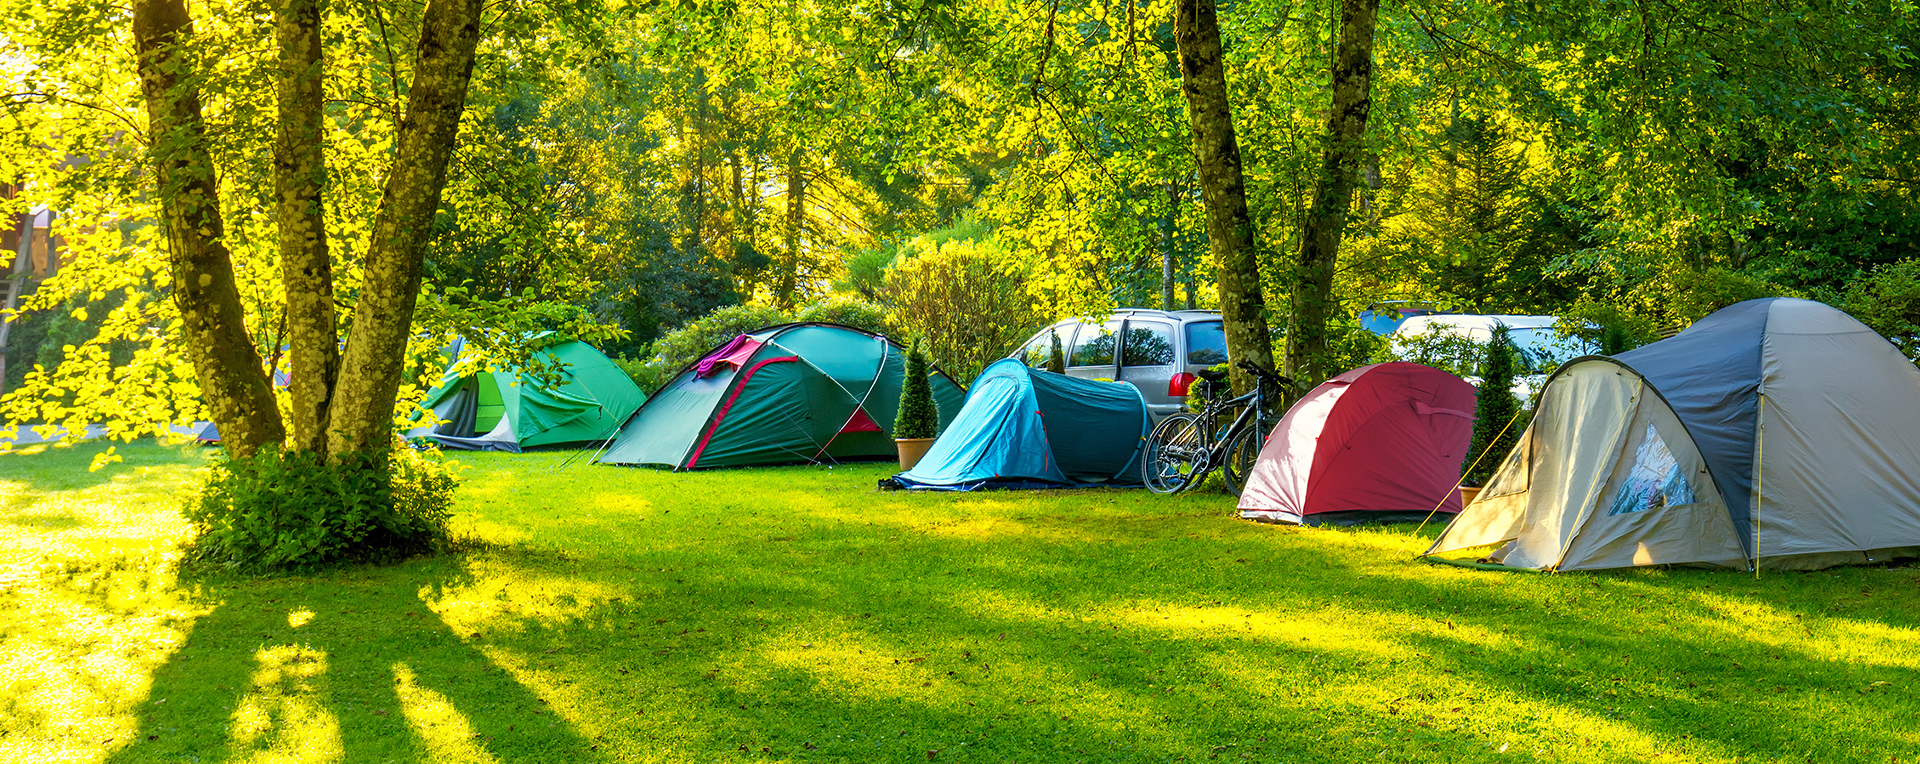 Camping in Bamberg